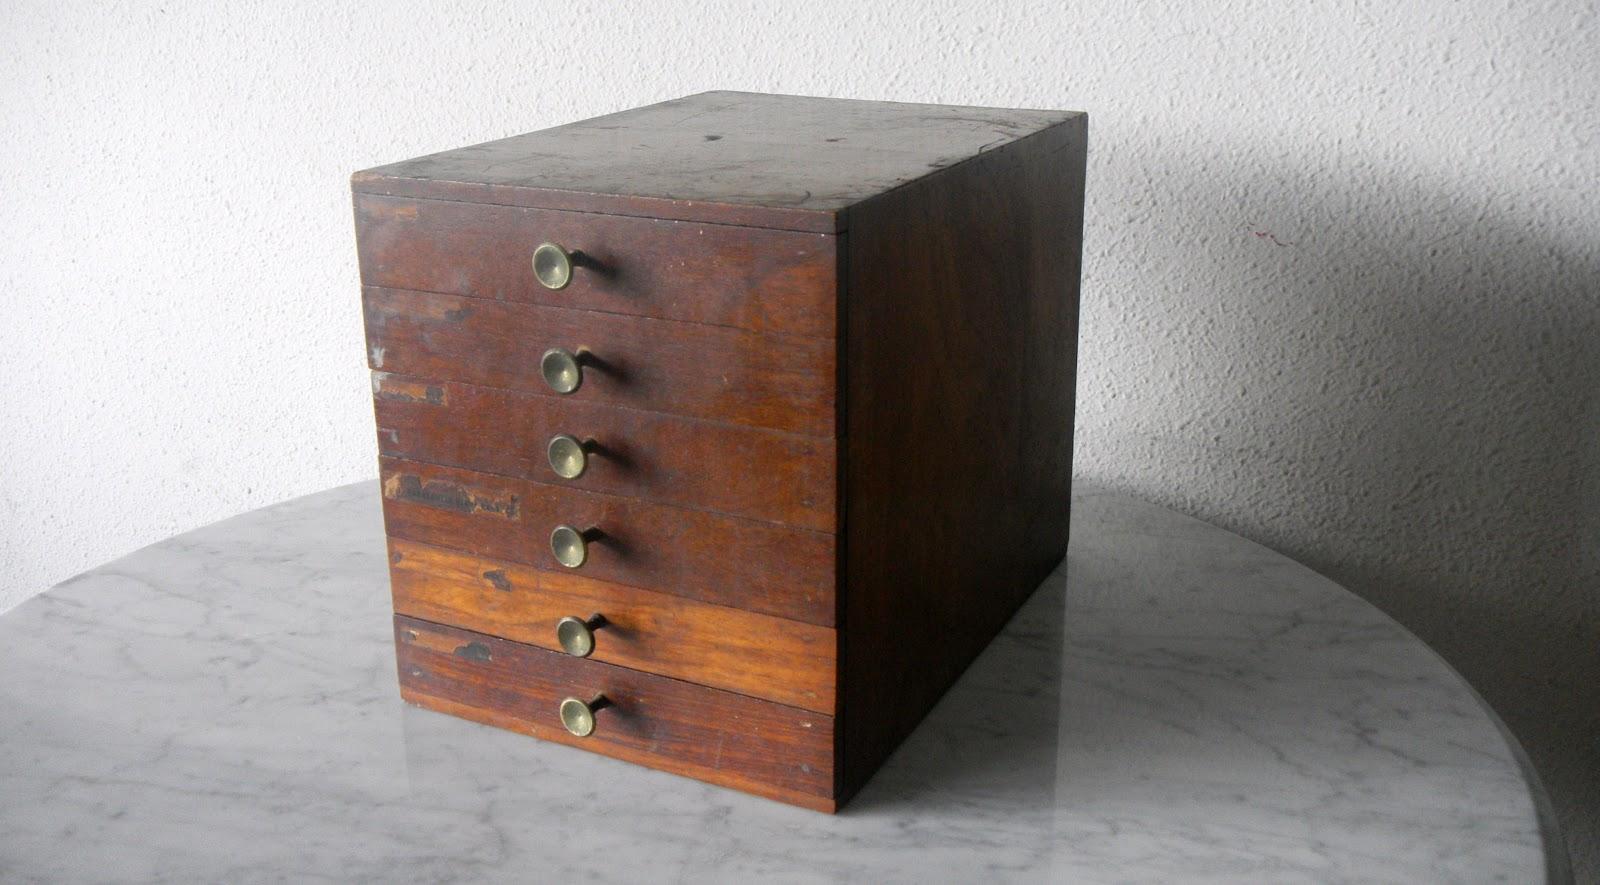 http://4.bp.blogspot.com/-a8rCHtfKx3c/UNgeI5sThxI/AAAAAAAANrw/c4DdZ_Y6RWw/s1600/paper+cabinet.JPG